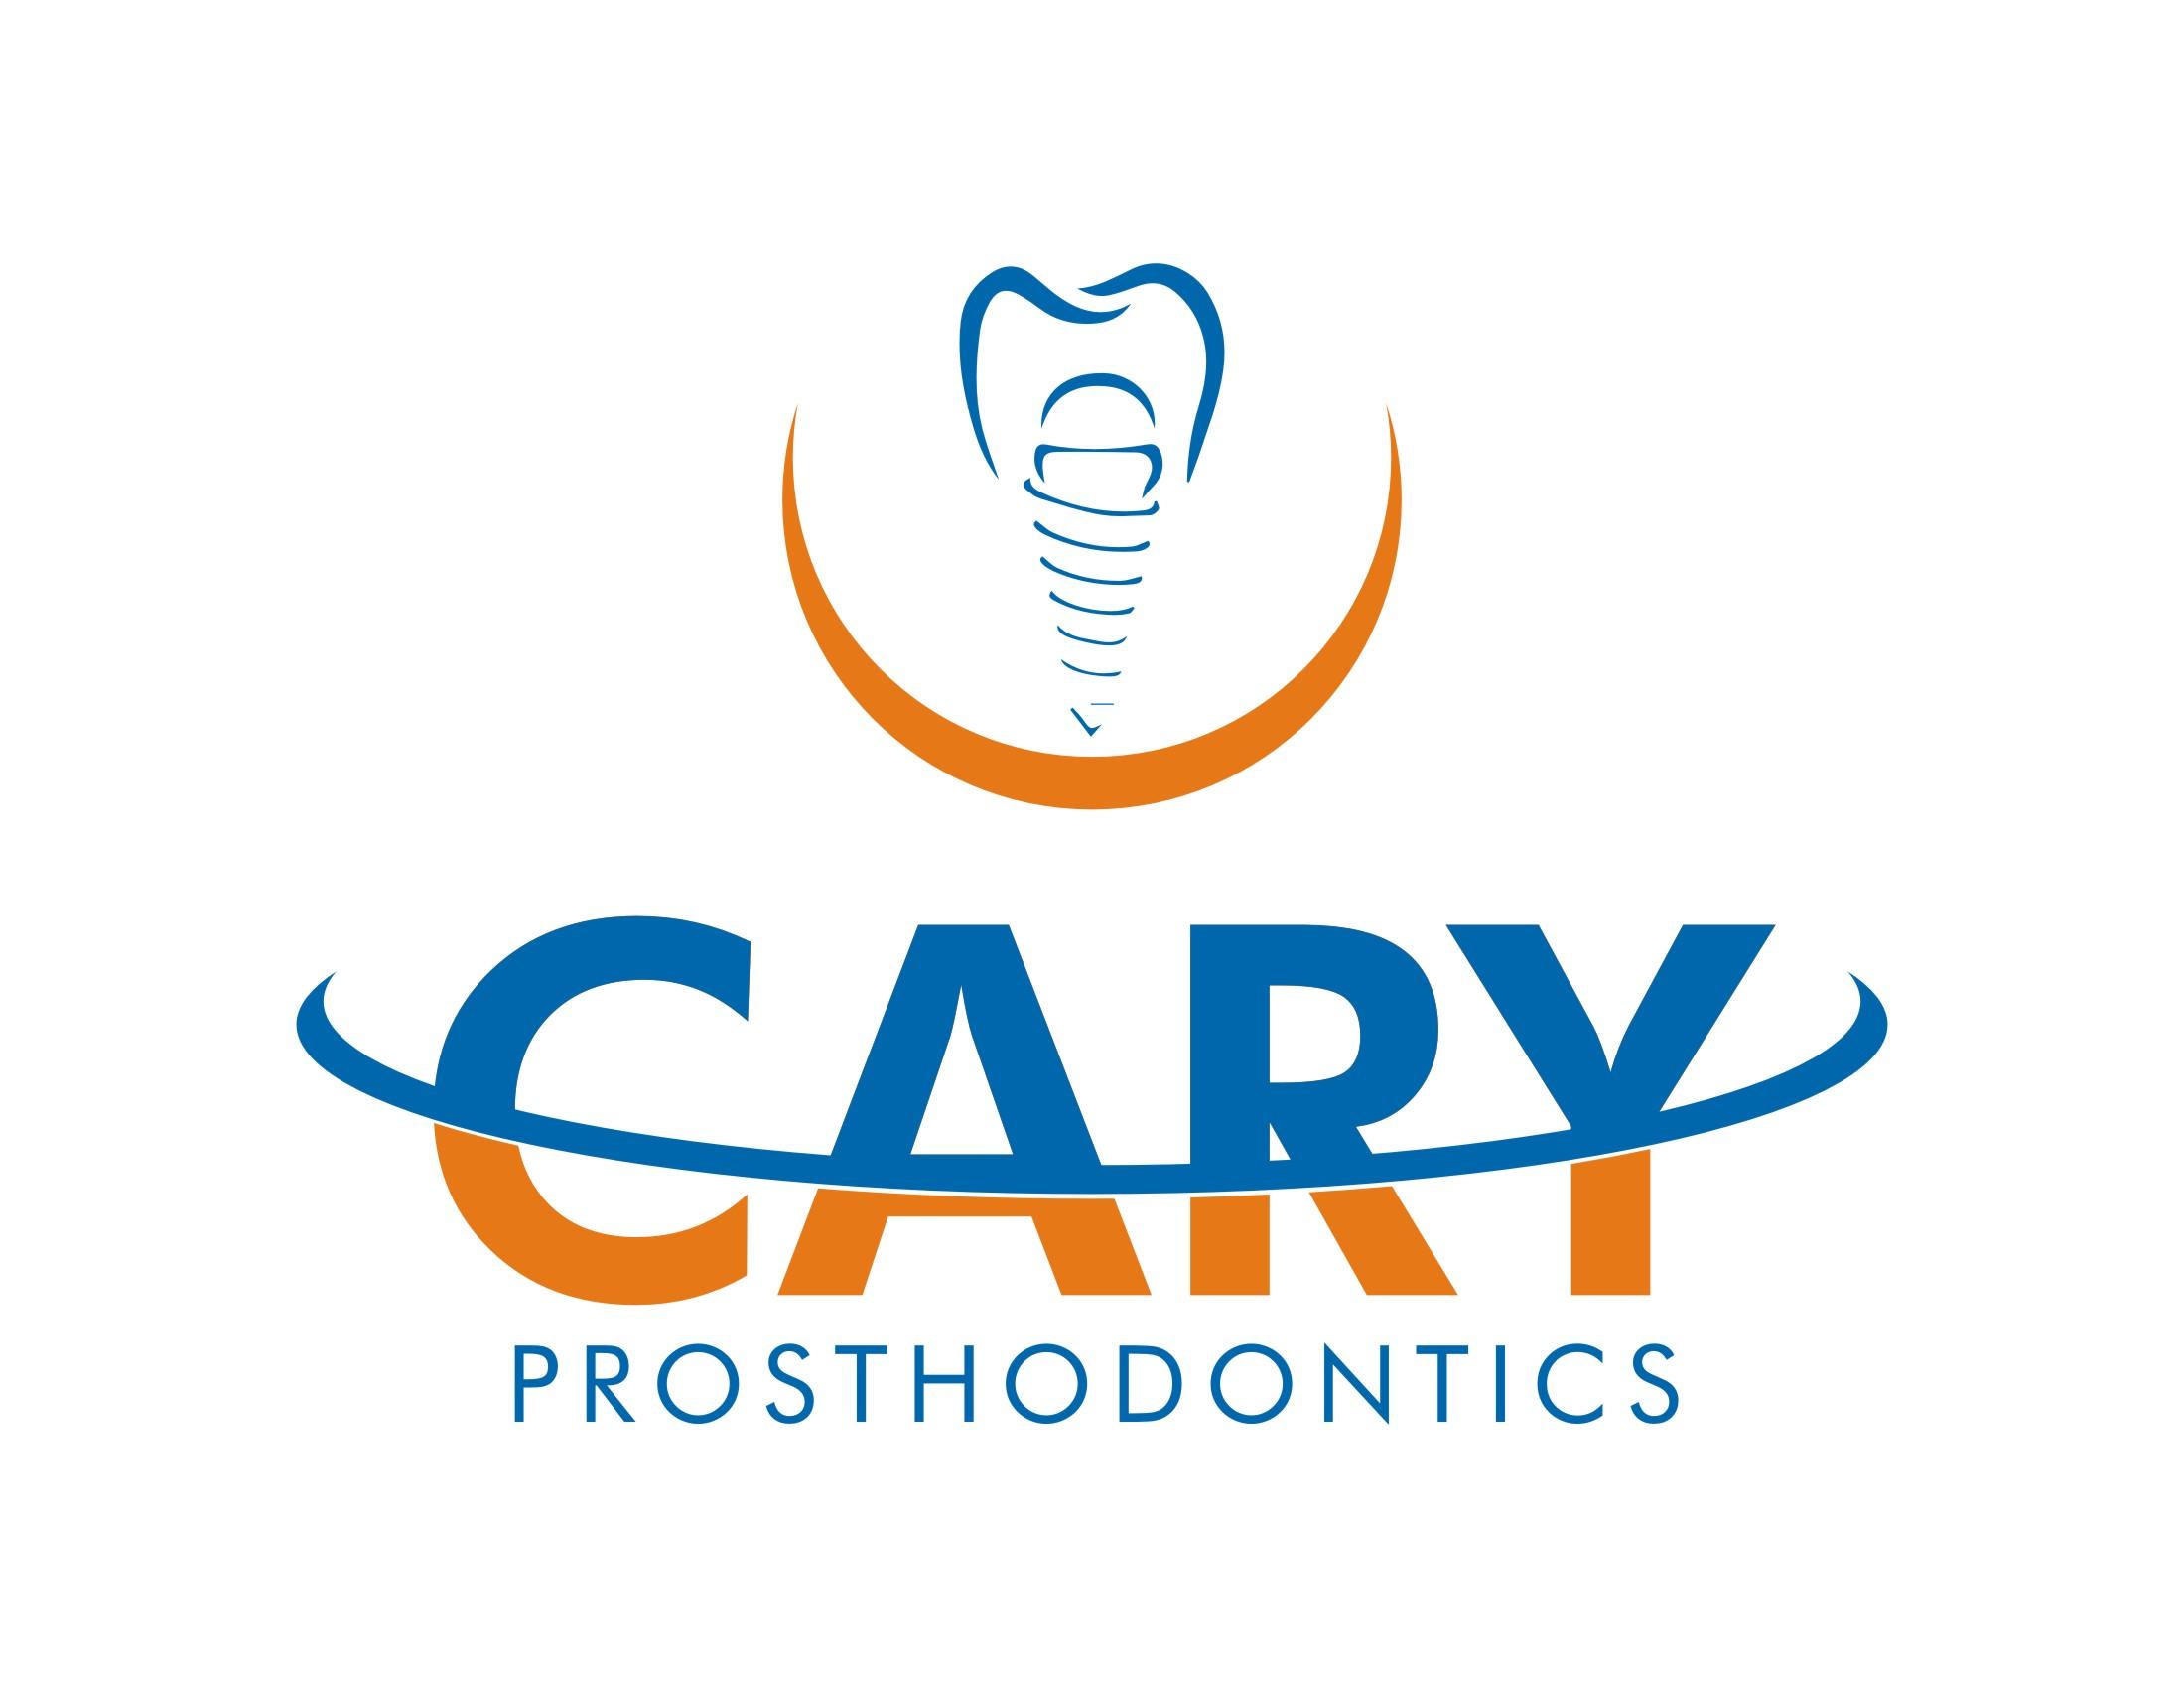 Logo Design by I graphics GRAPHICS - Entry No. 203 in the Logo Design Contest Cary Prosthodontics Logo Design.